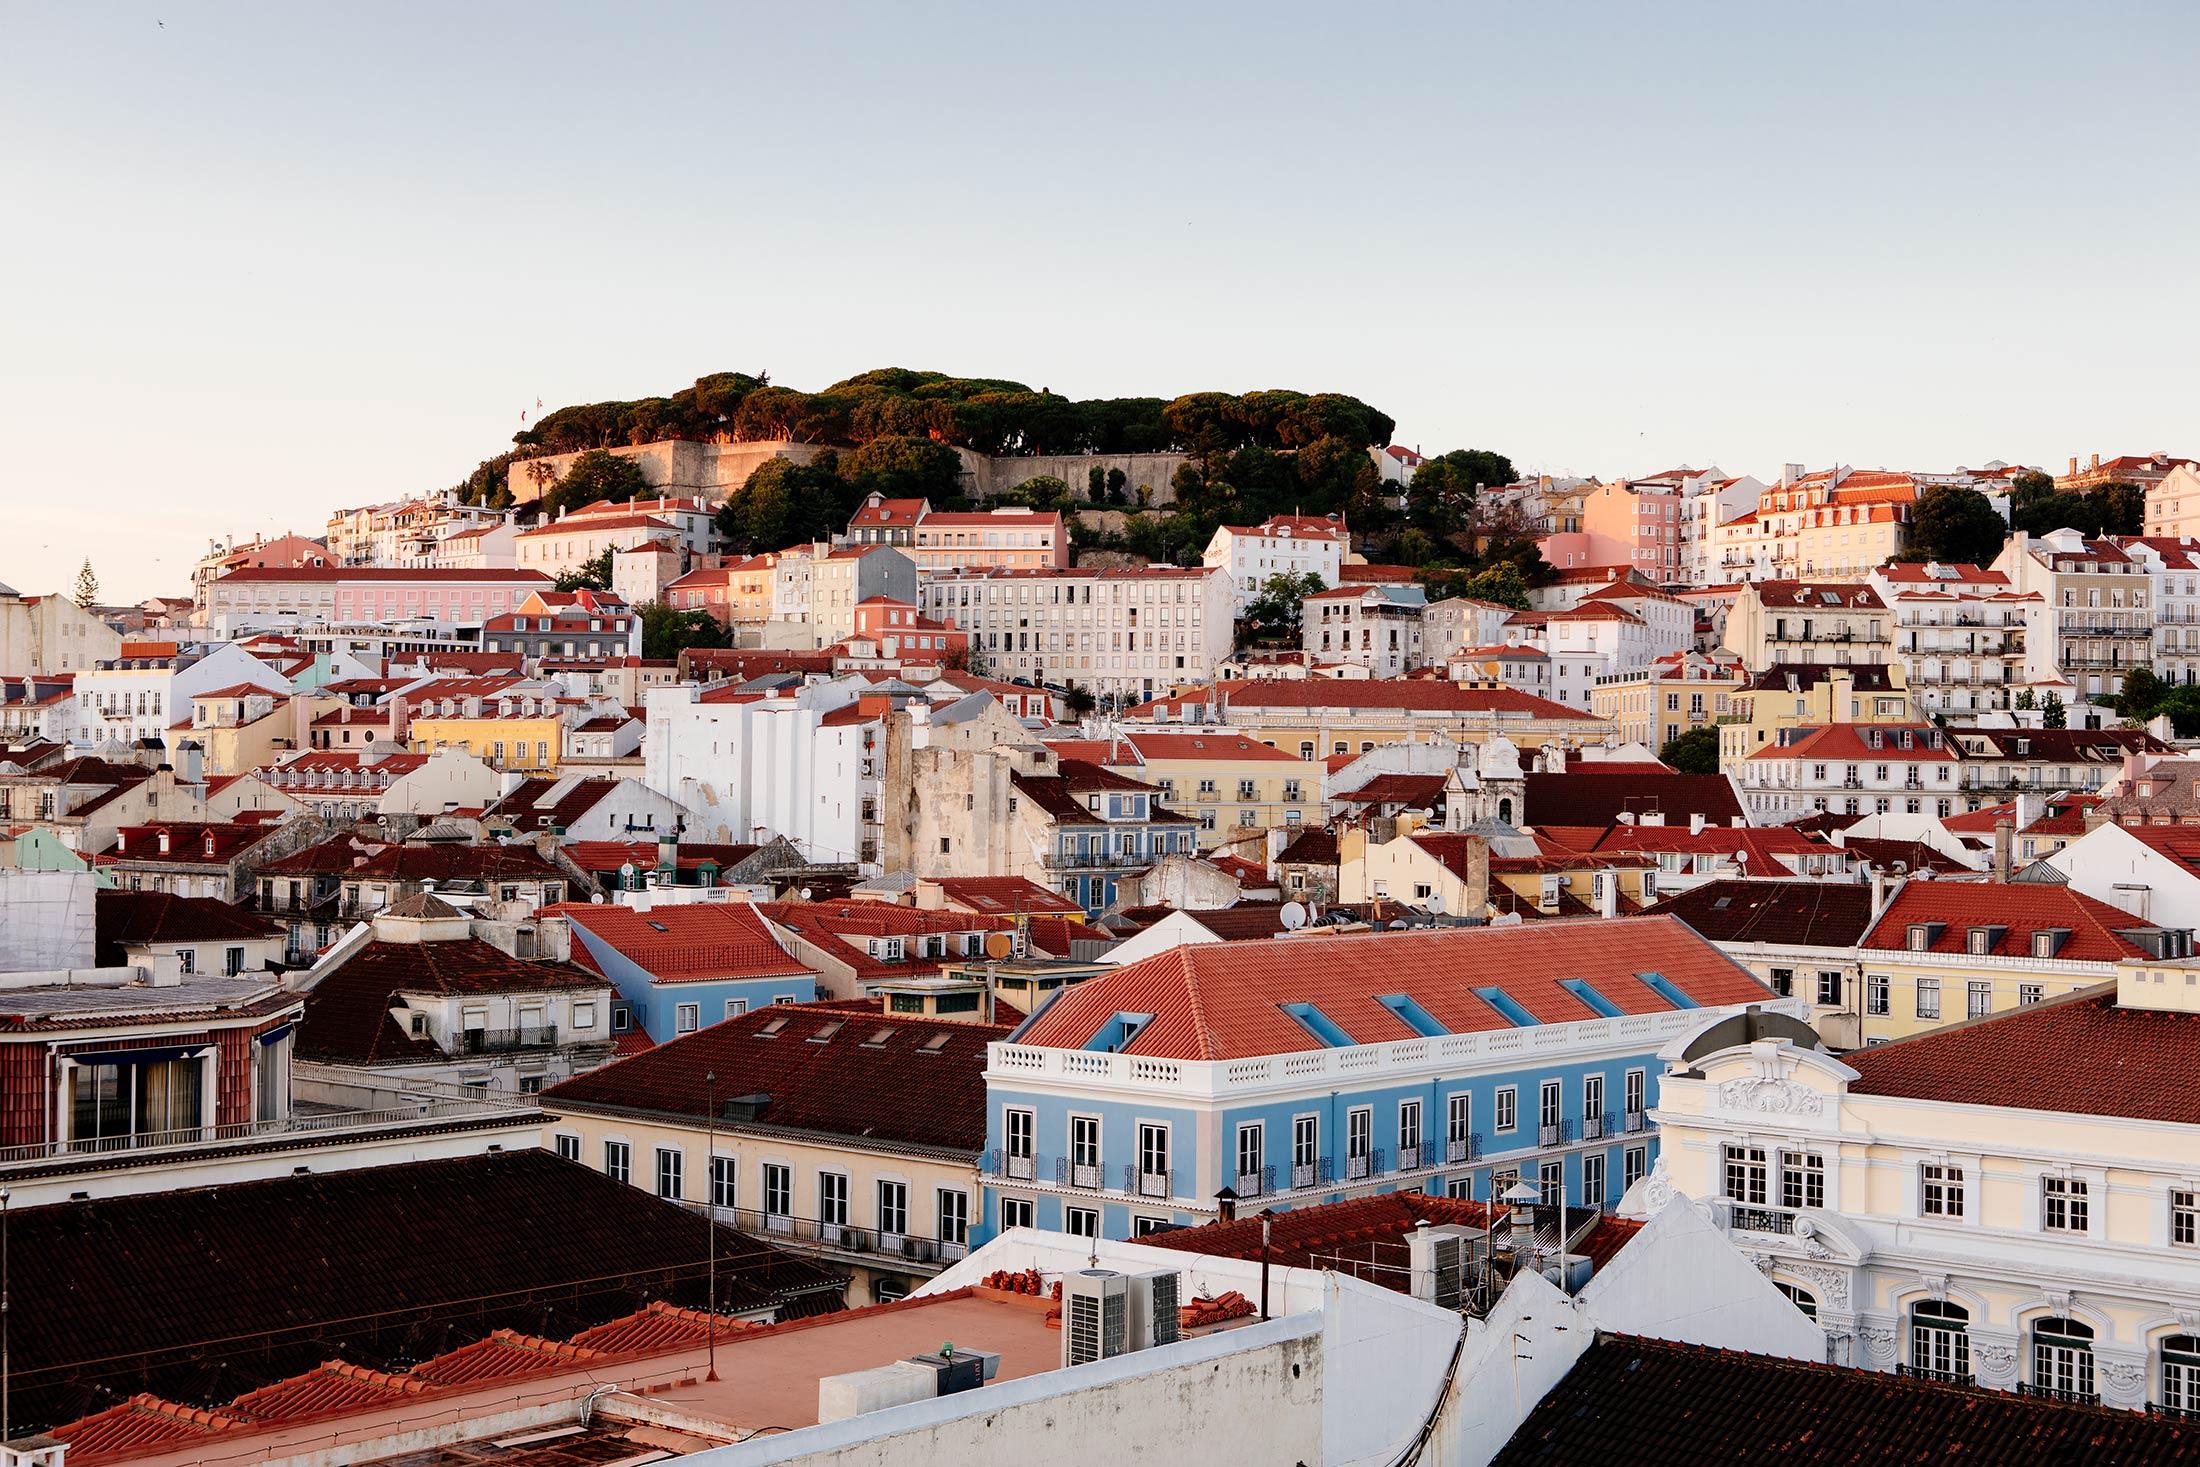 LIS_Lissabon_10-Mitja_Schneehage